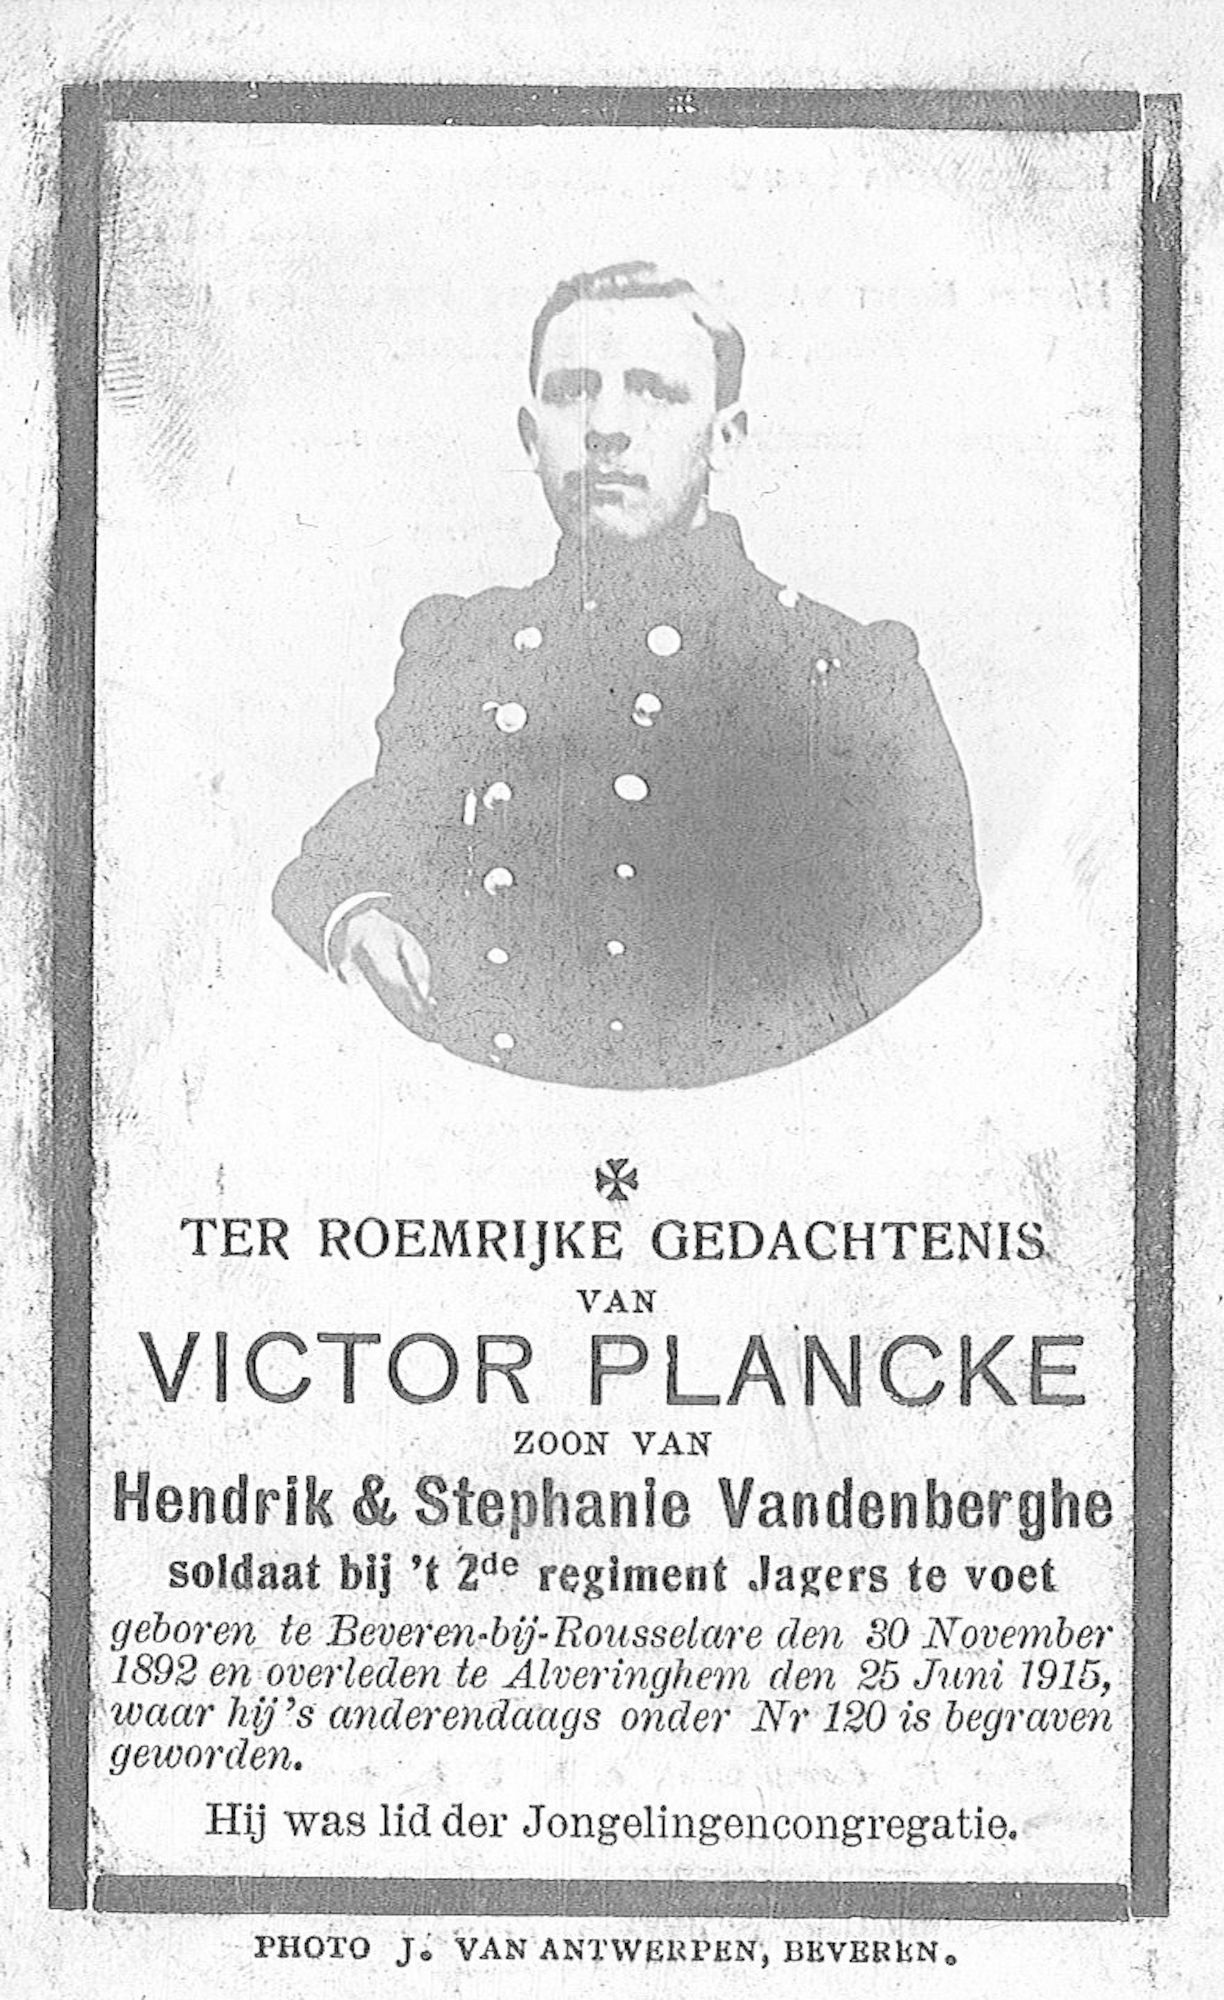 Victor Plancke